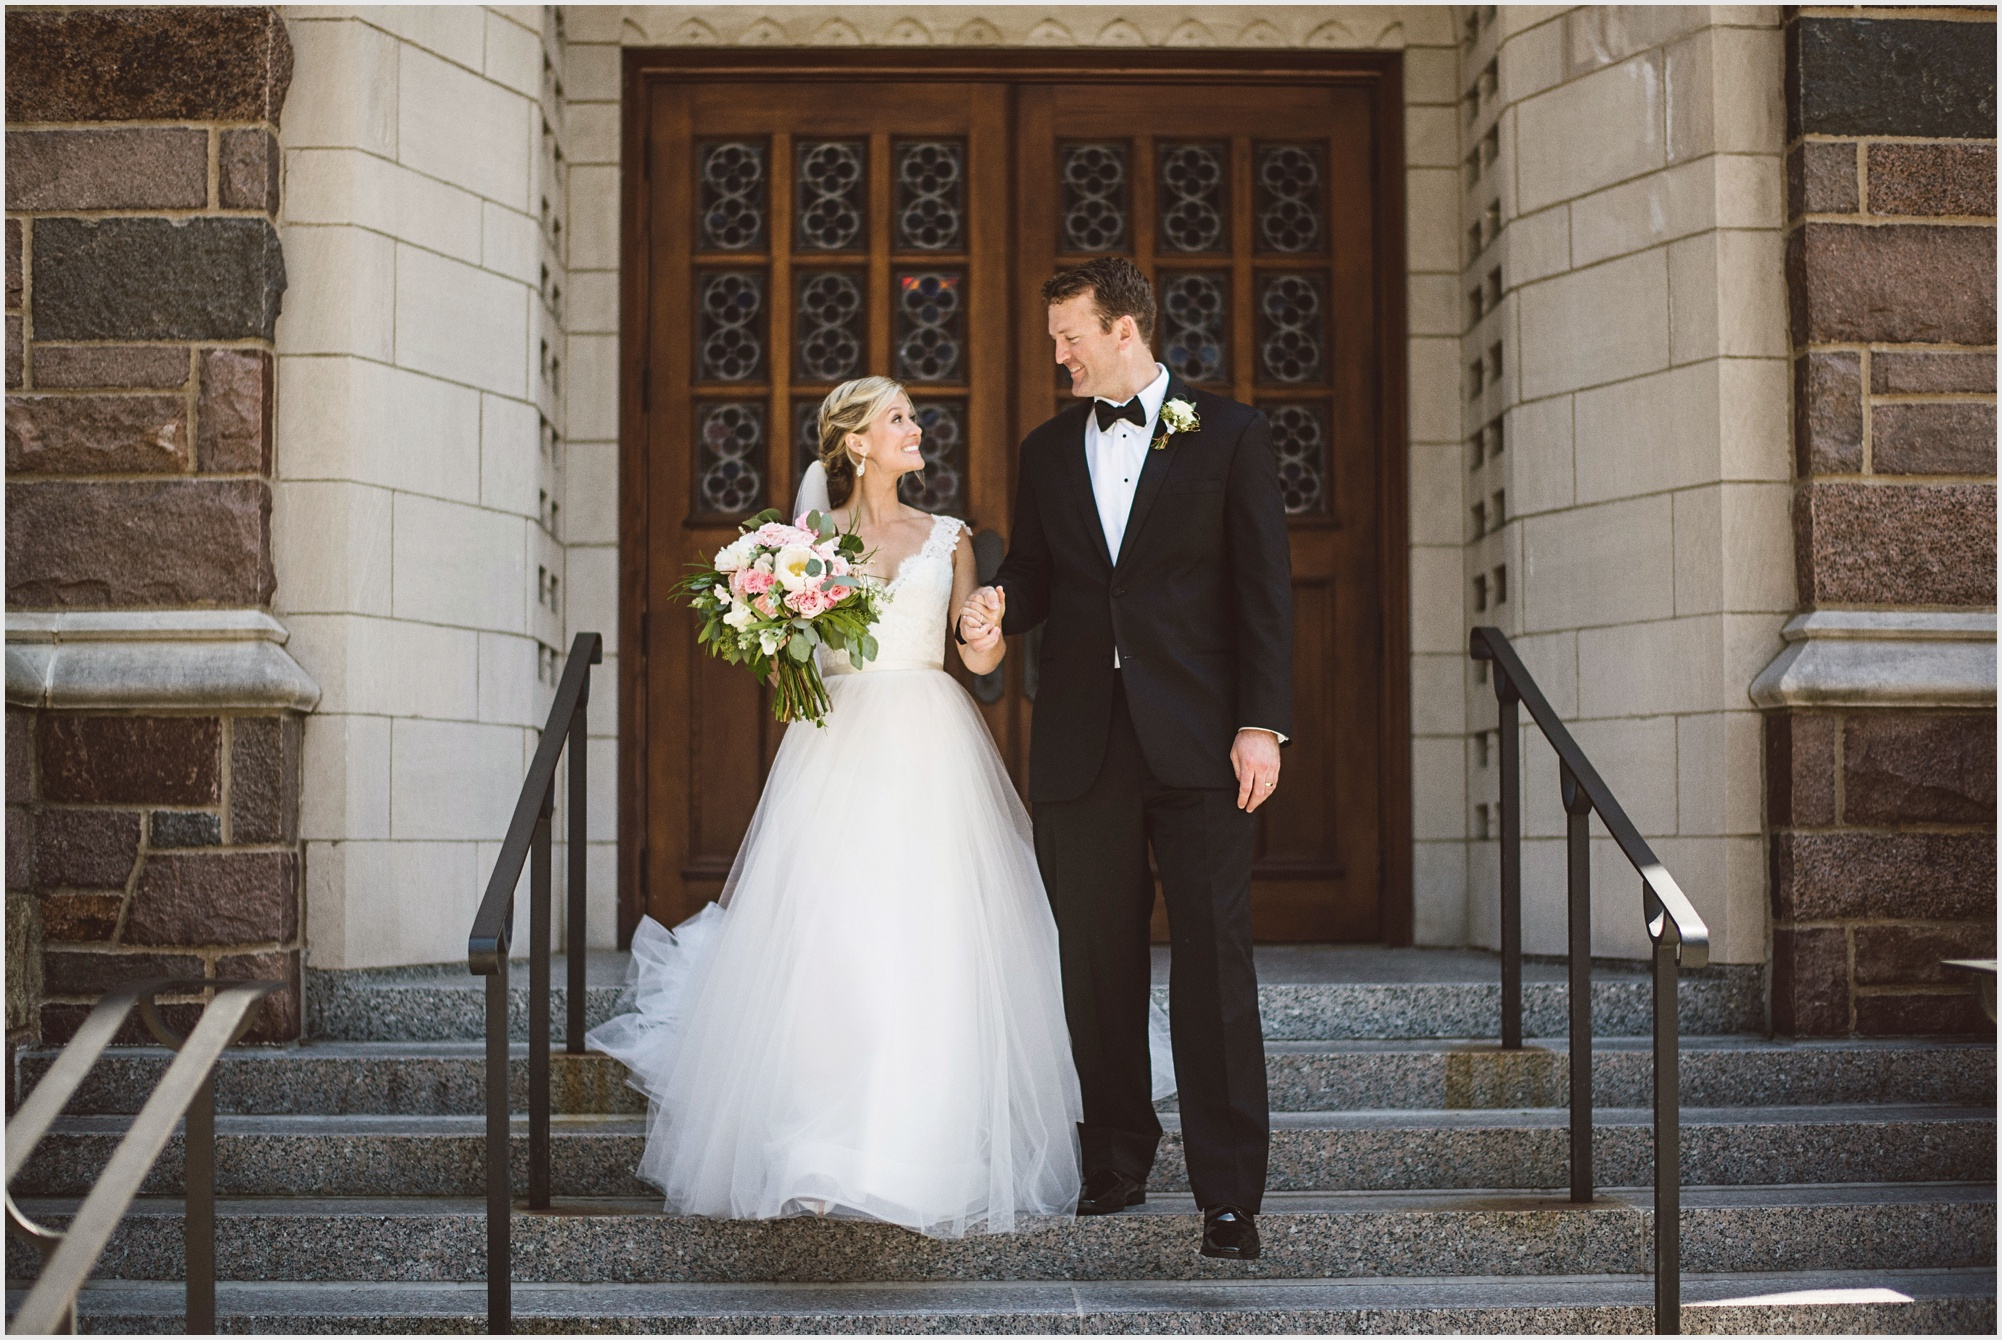 maura_david_james_j_hill_wedding_lucas_botz_photography_020.jpg